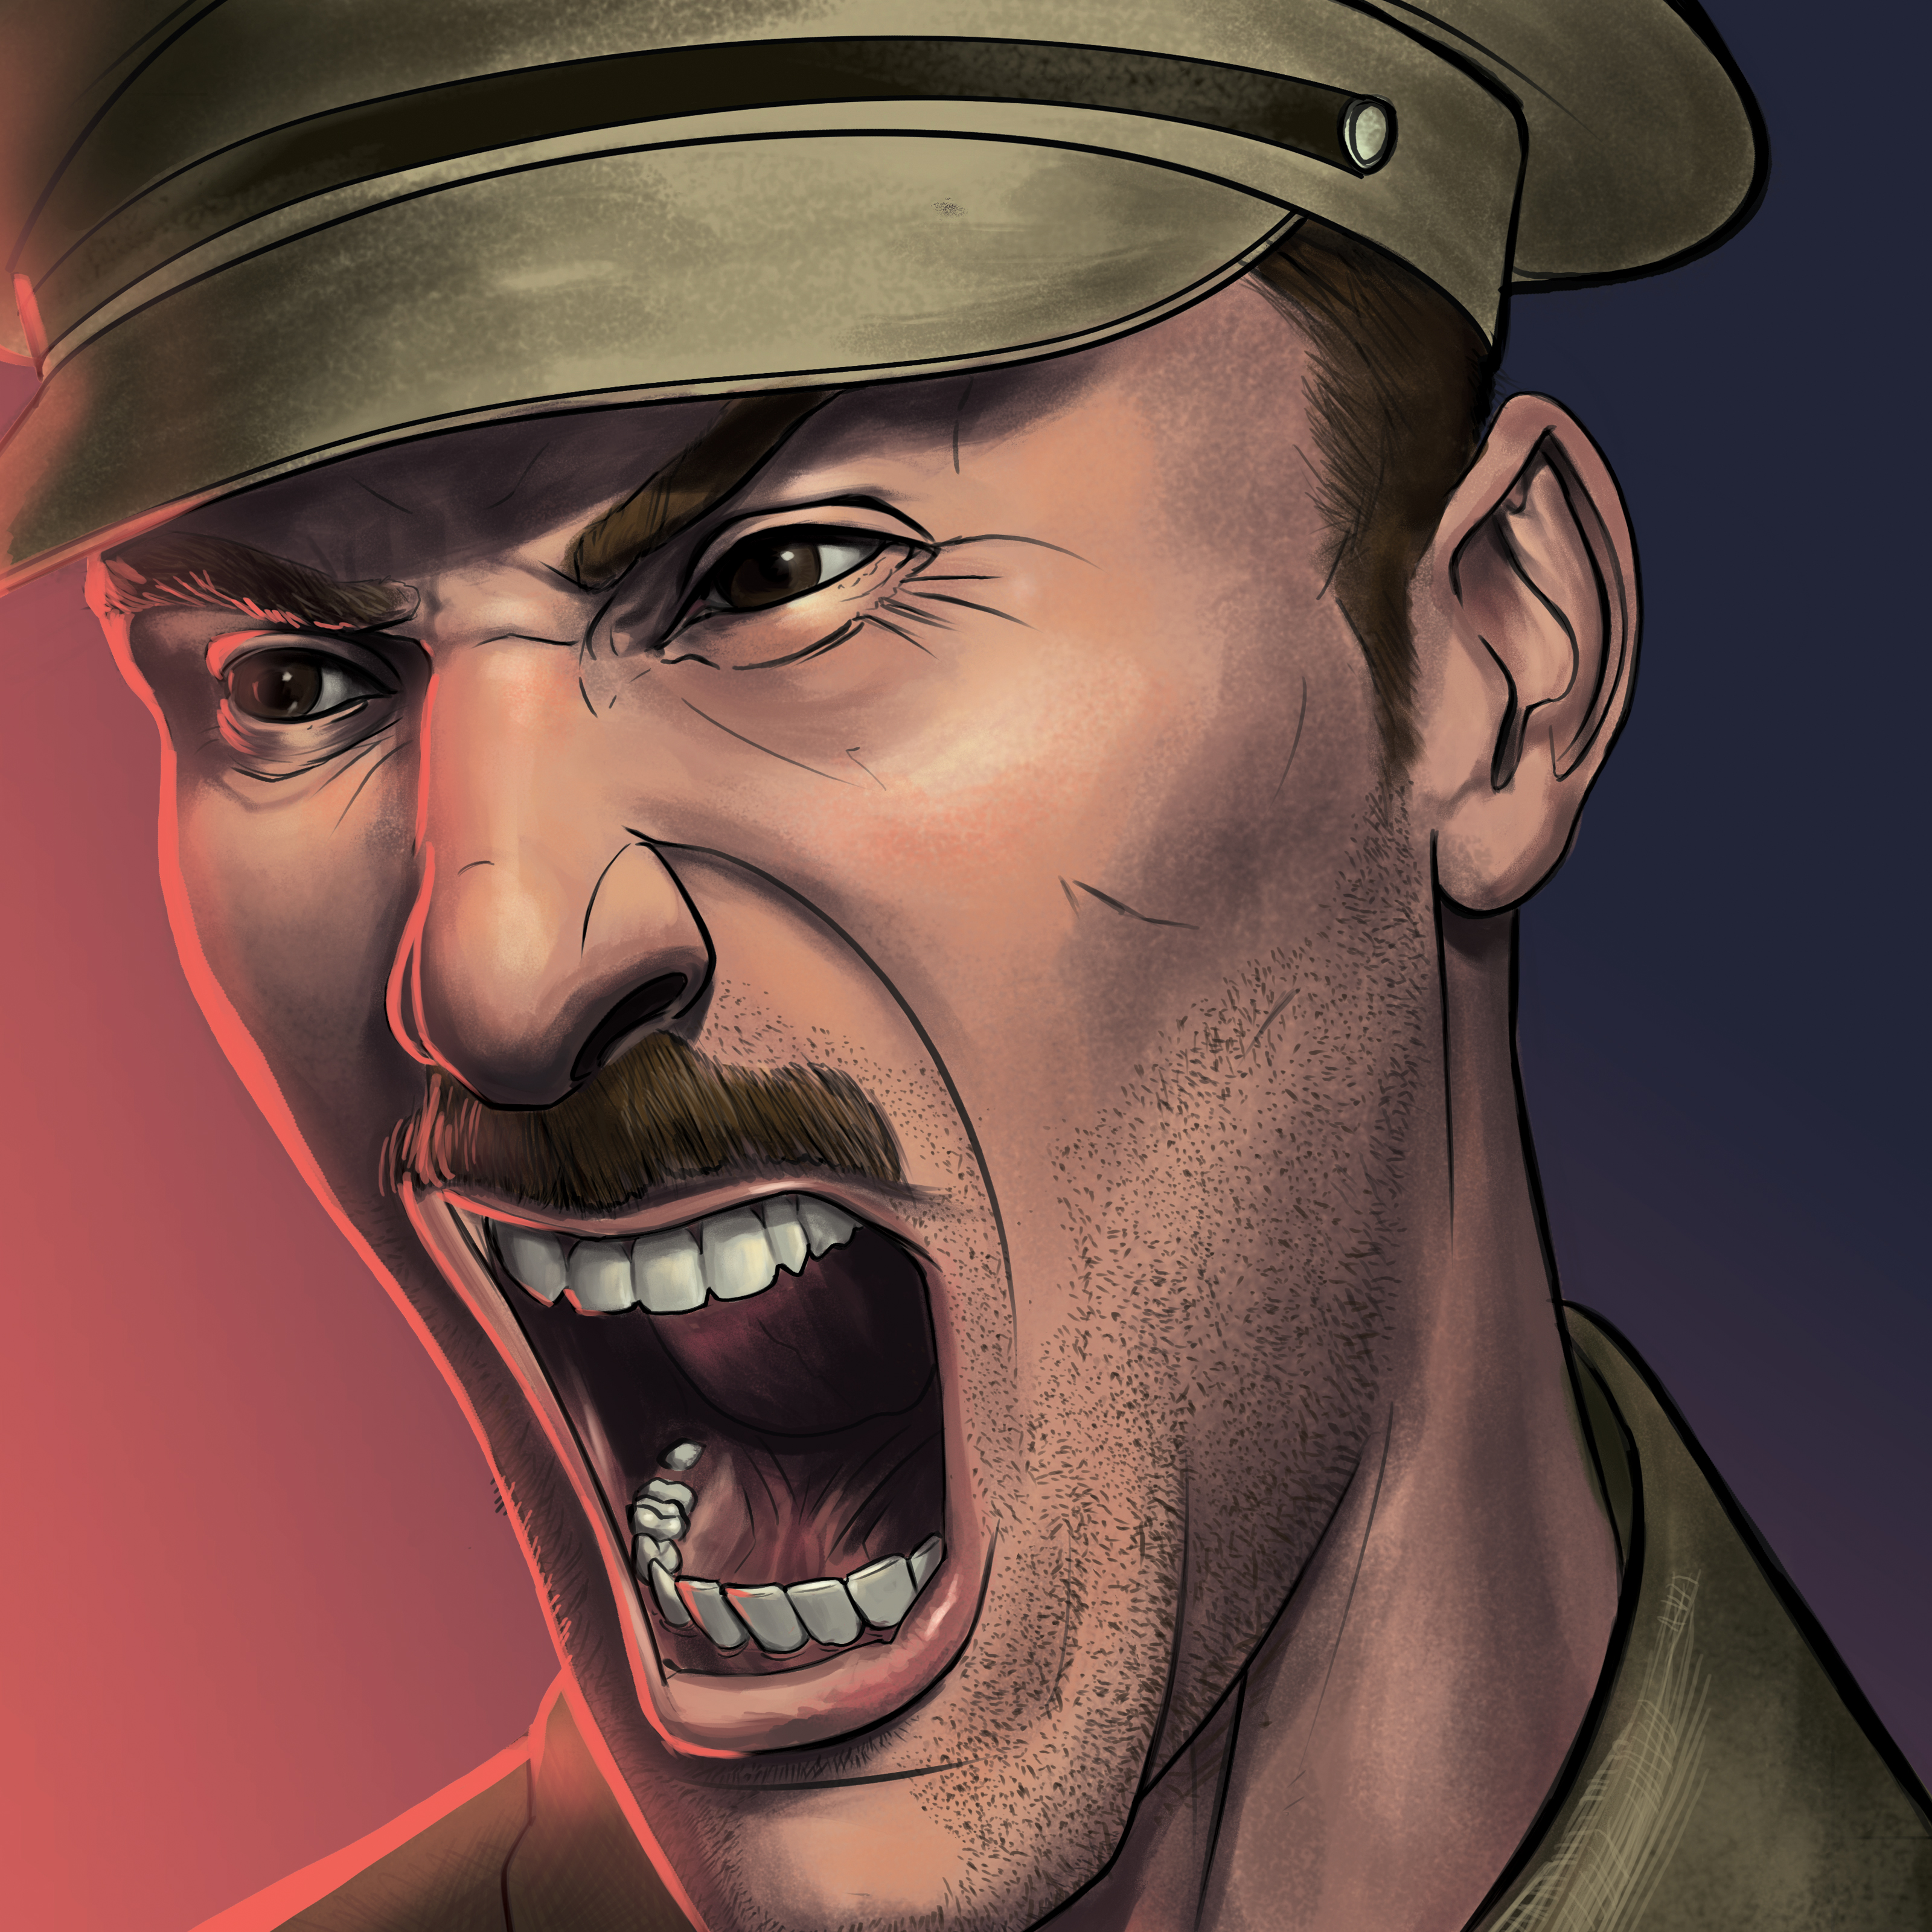 British Officer Yelling